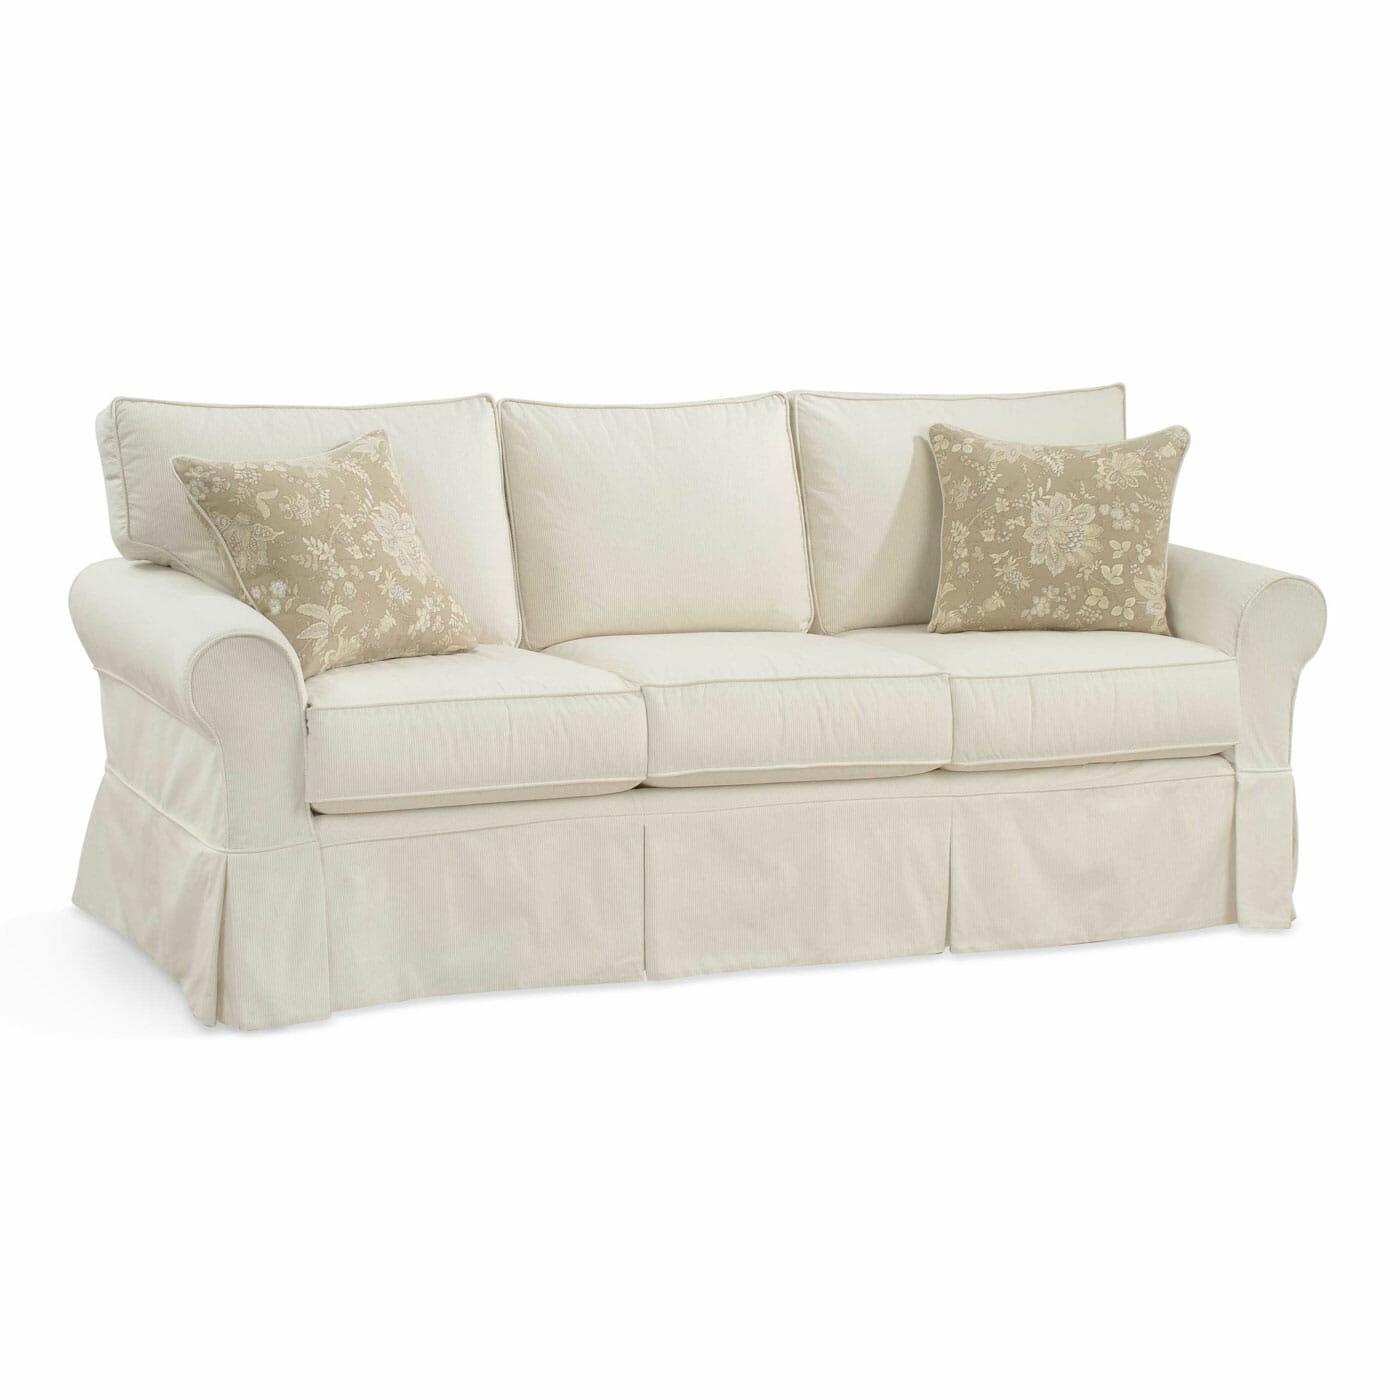 camden sofa bed black leather recliner set slipcovered cottage home